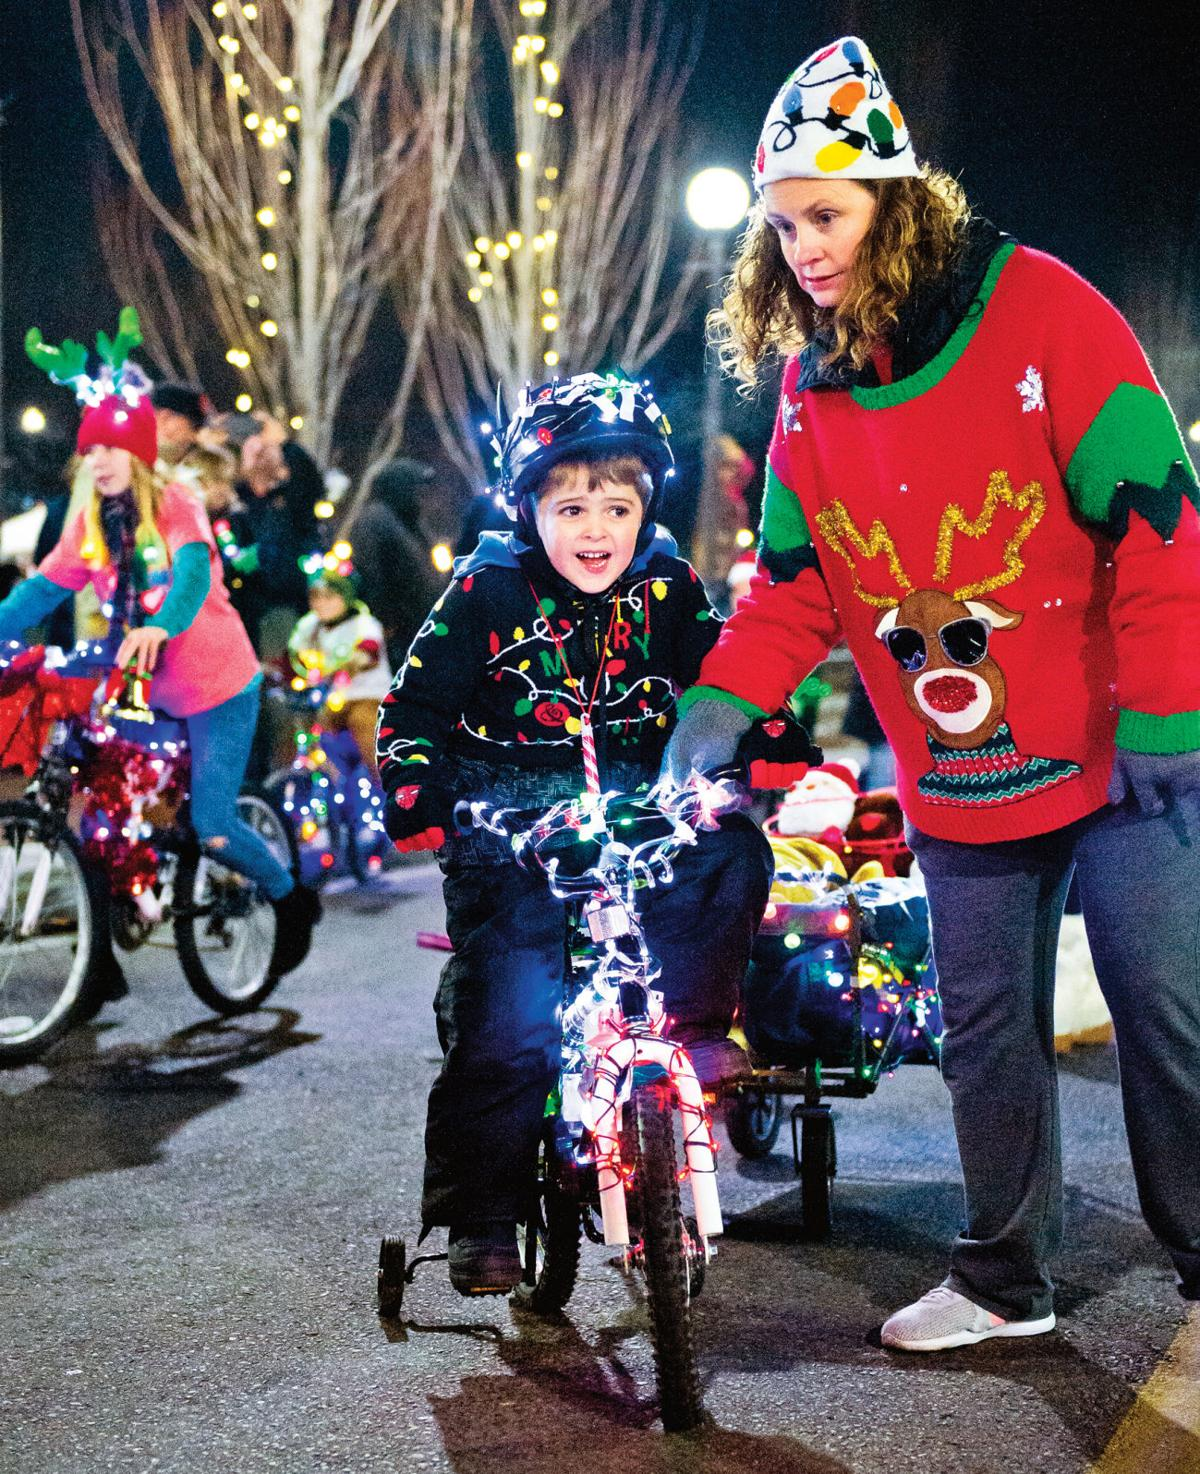 12_11_Kids Christmas Parade_Bike.jpg